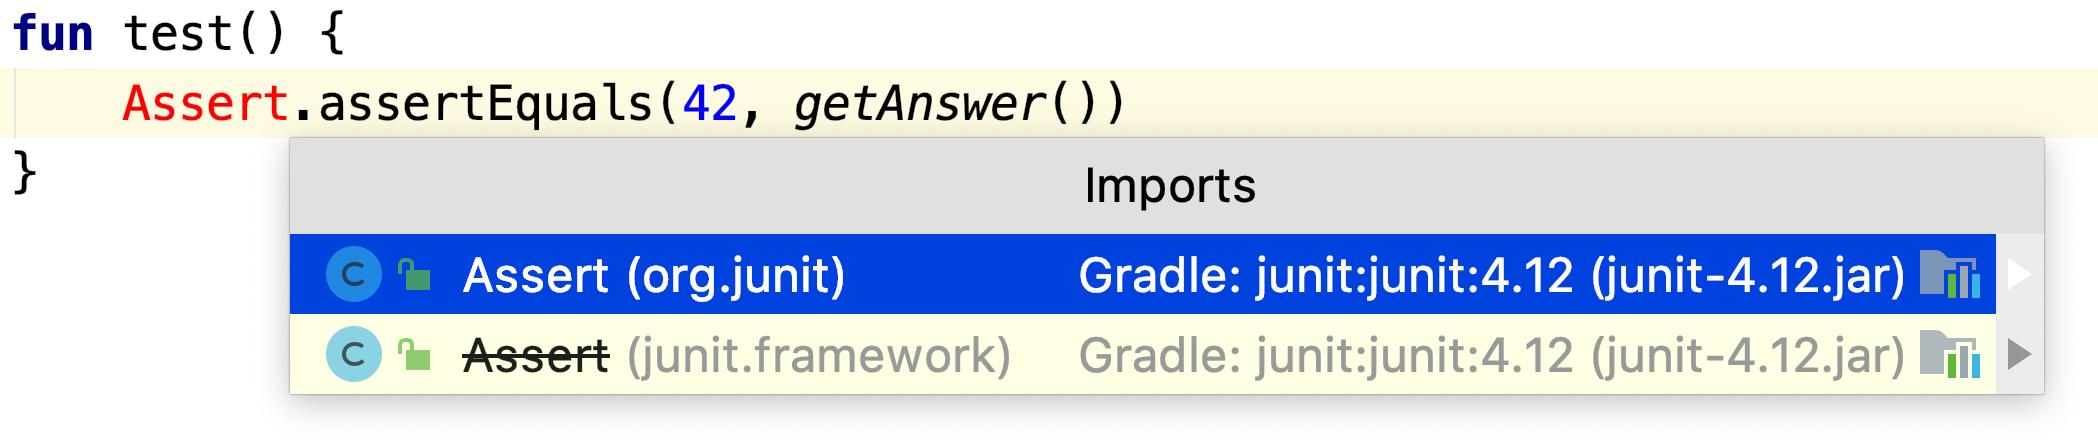 deprecated_imports